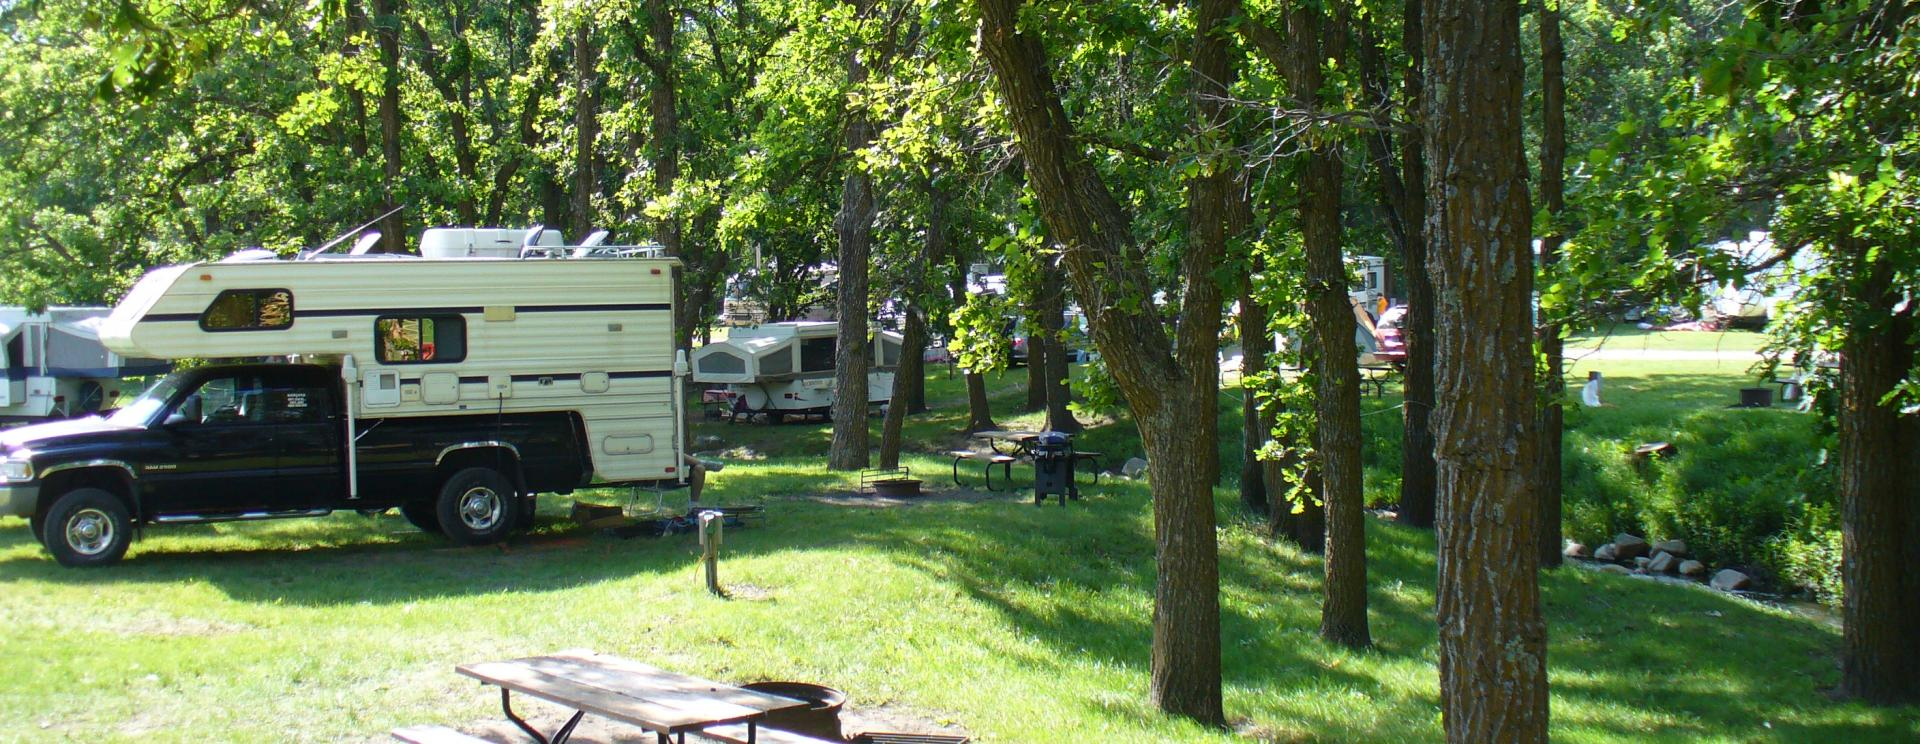 Spokane Creek Cabins & Campgound